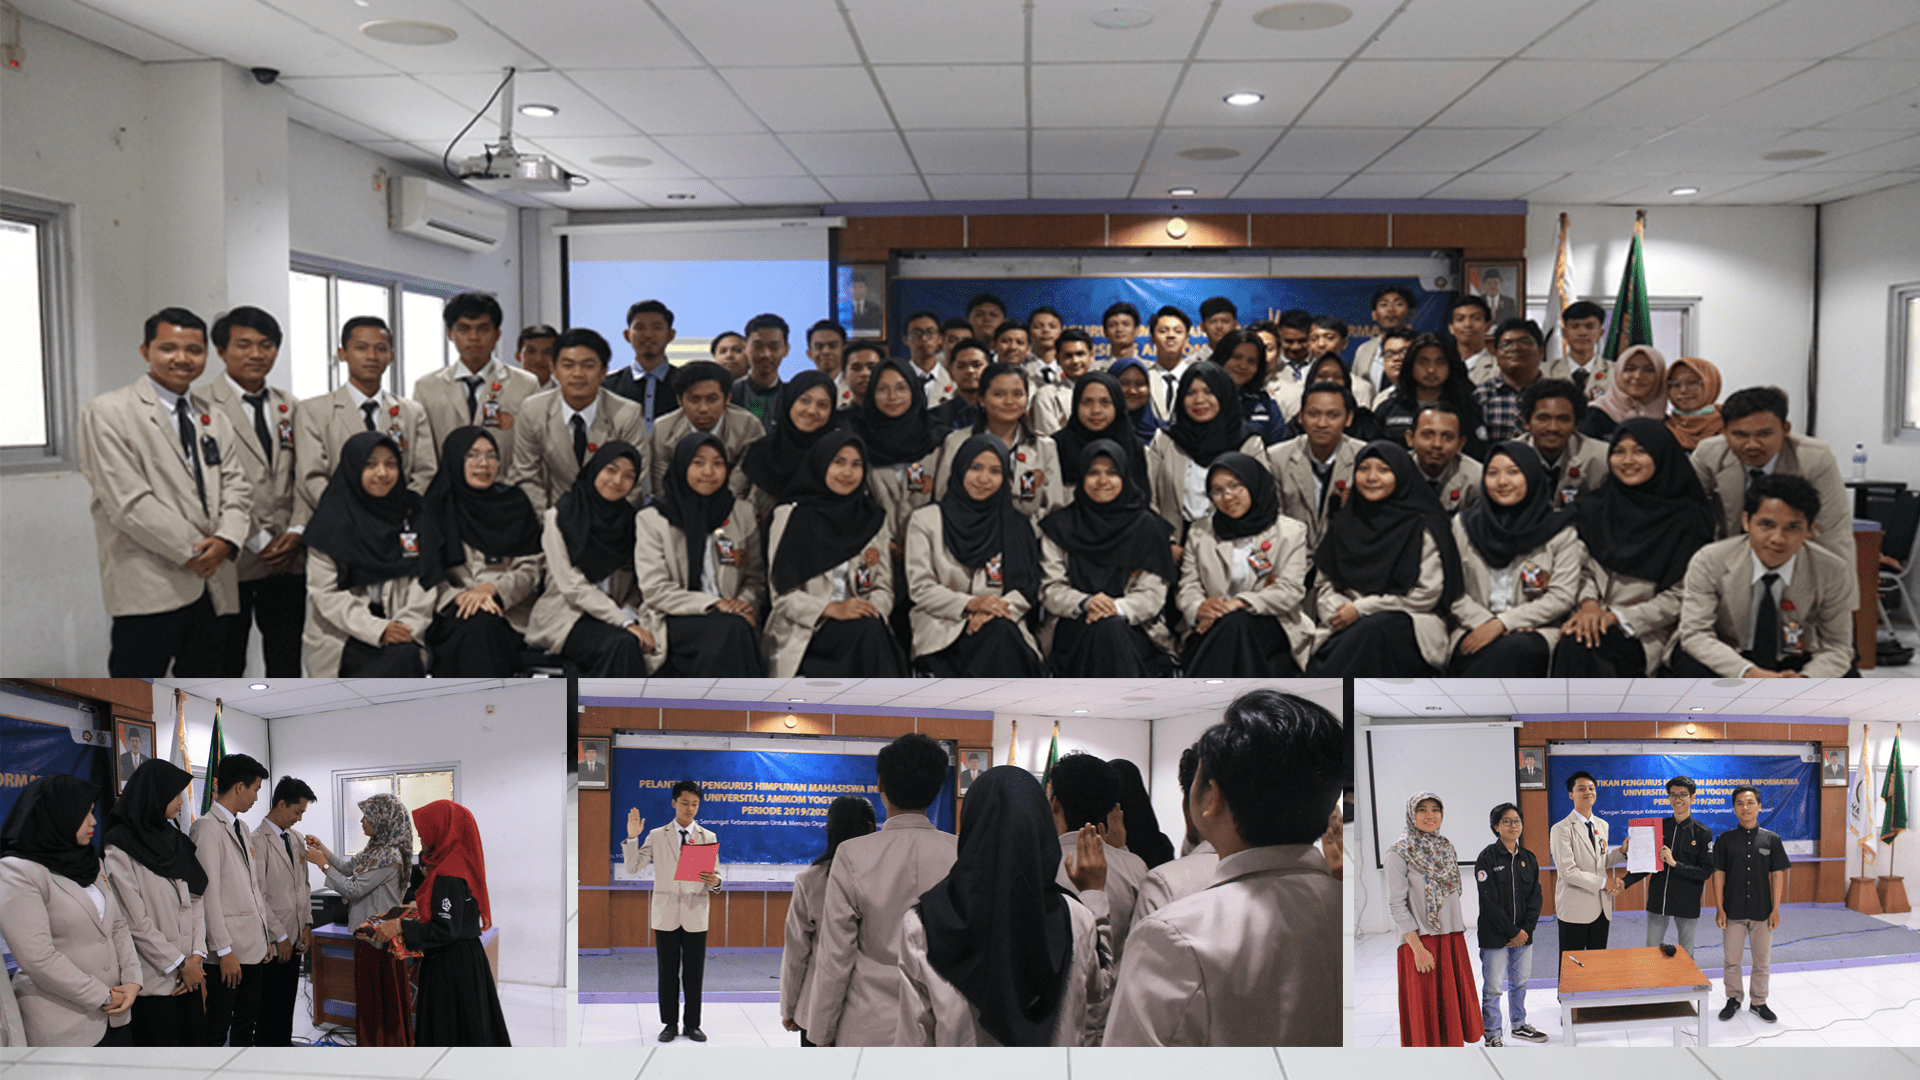 Berita Acara Pelantikan Pengurus Himpunan Mahasiswa Informatika Universitas AMIKOM Yogyakarta periode 2019/2020